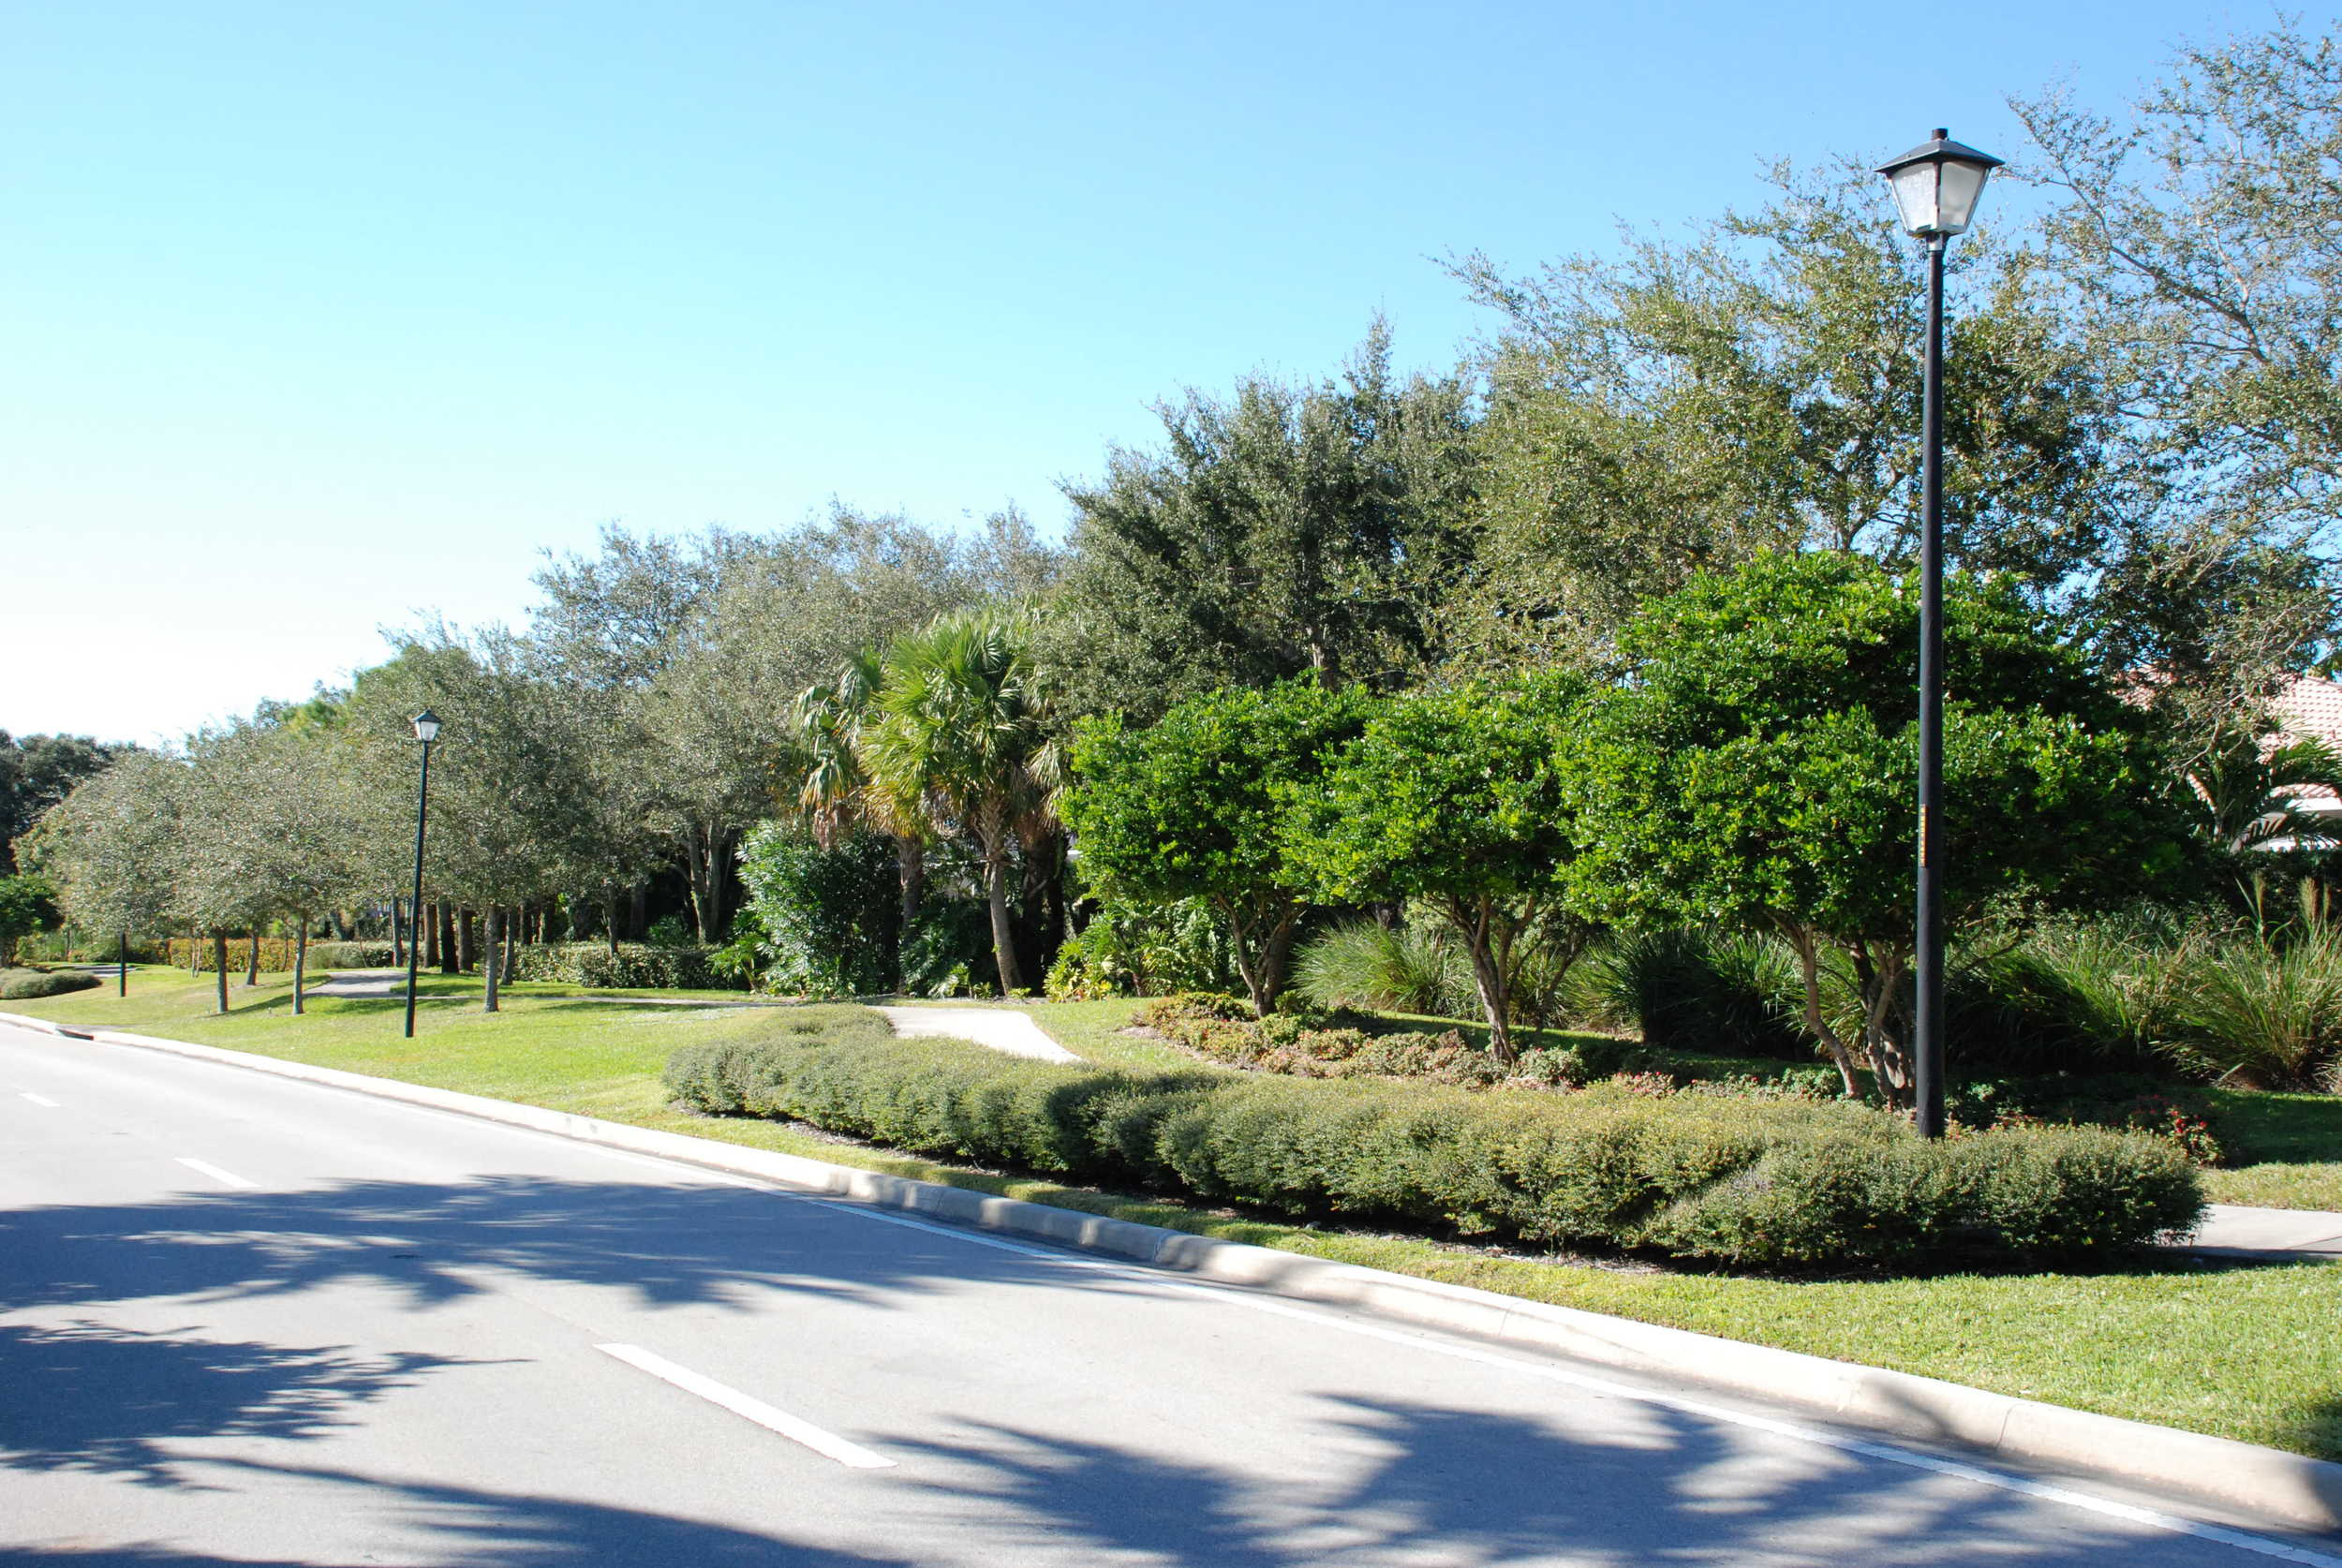 Burns Road Palm Beach Gardens Florida Roadway Landscaping.JPG